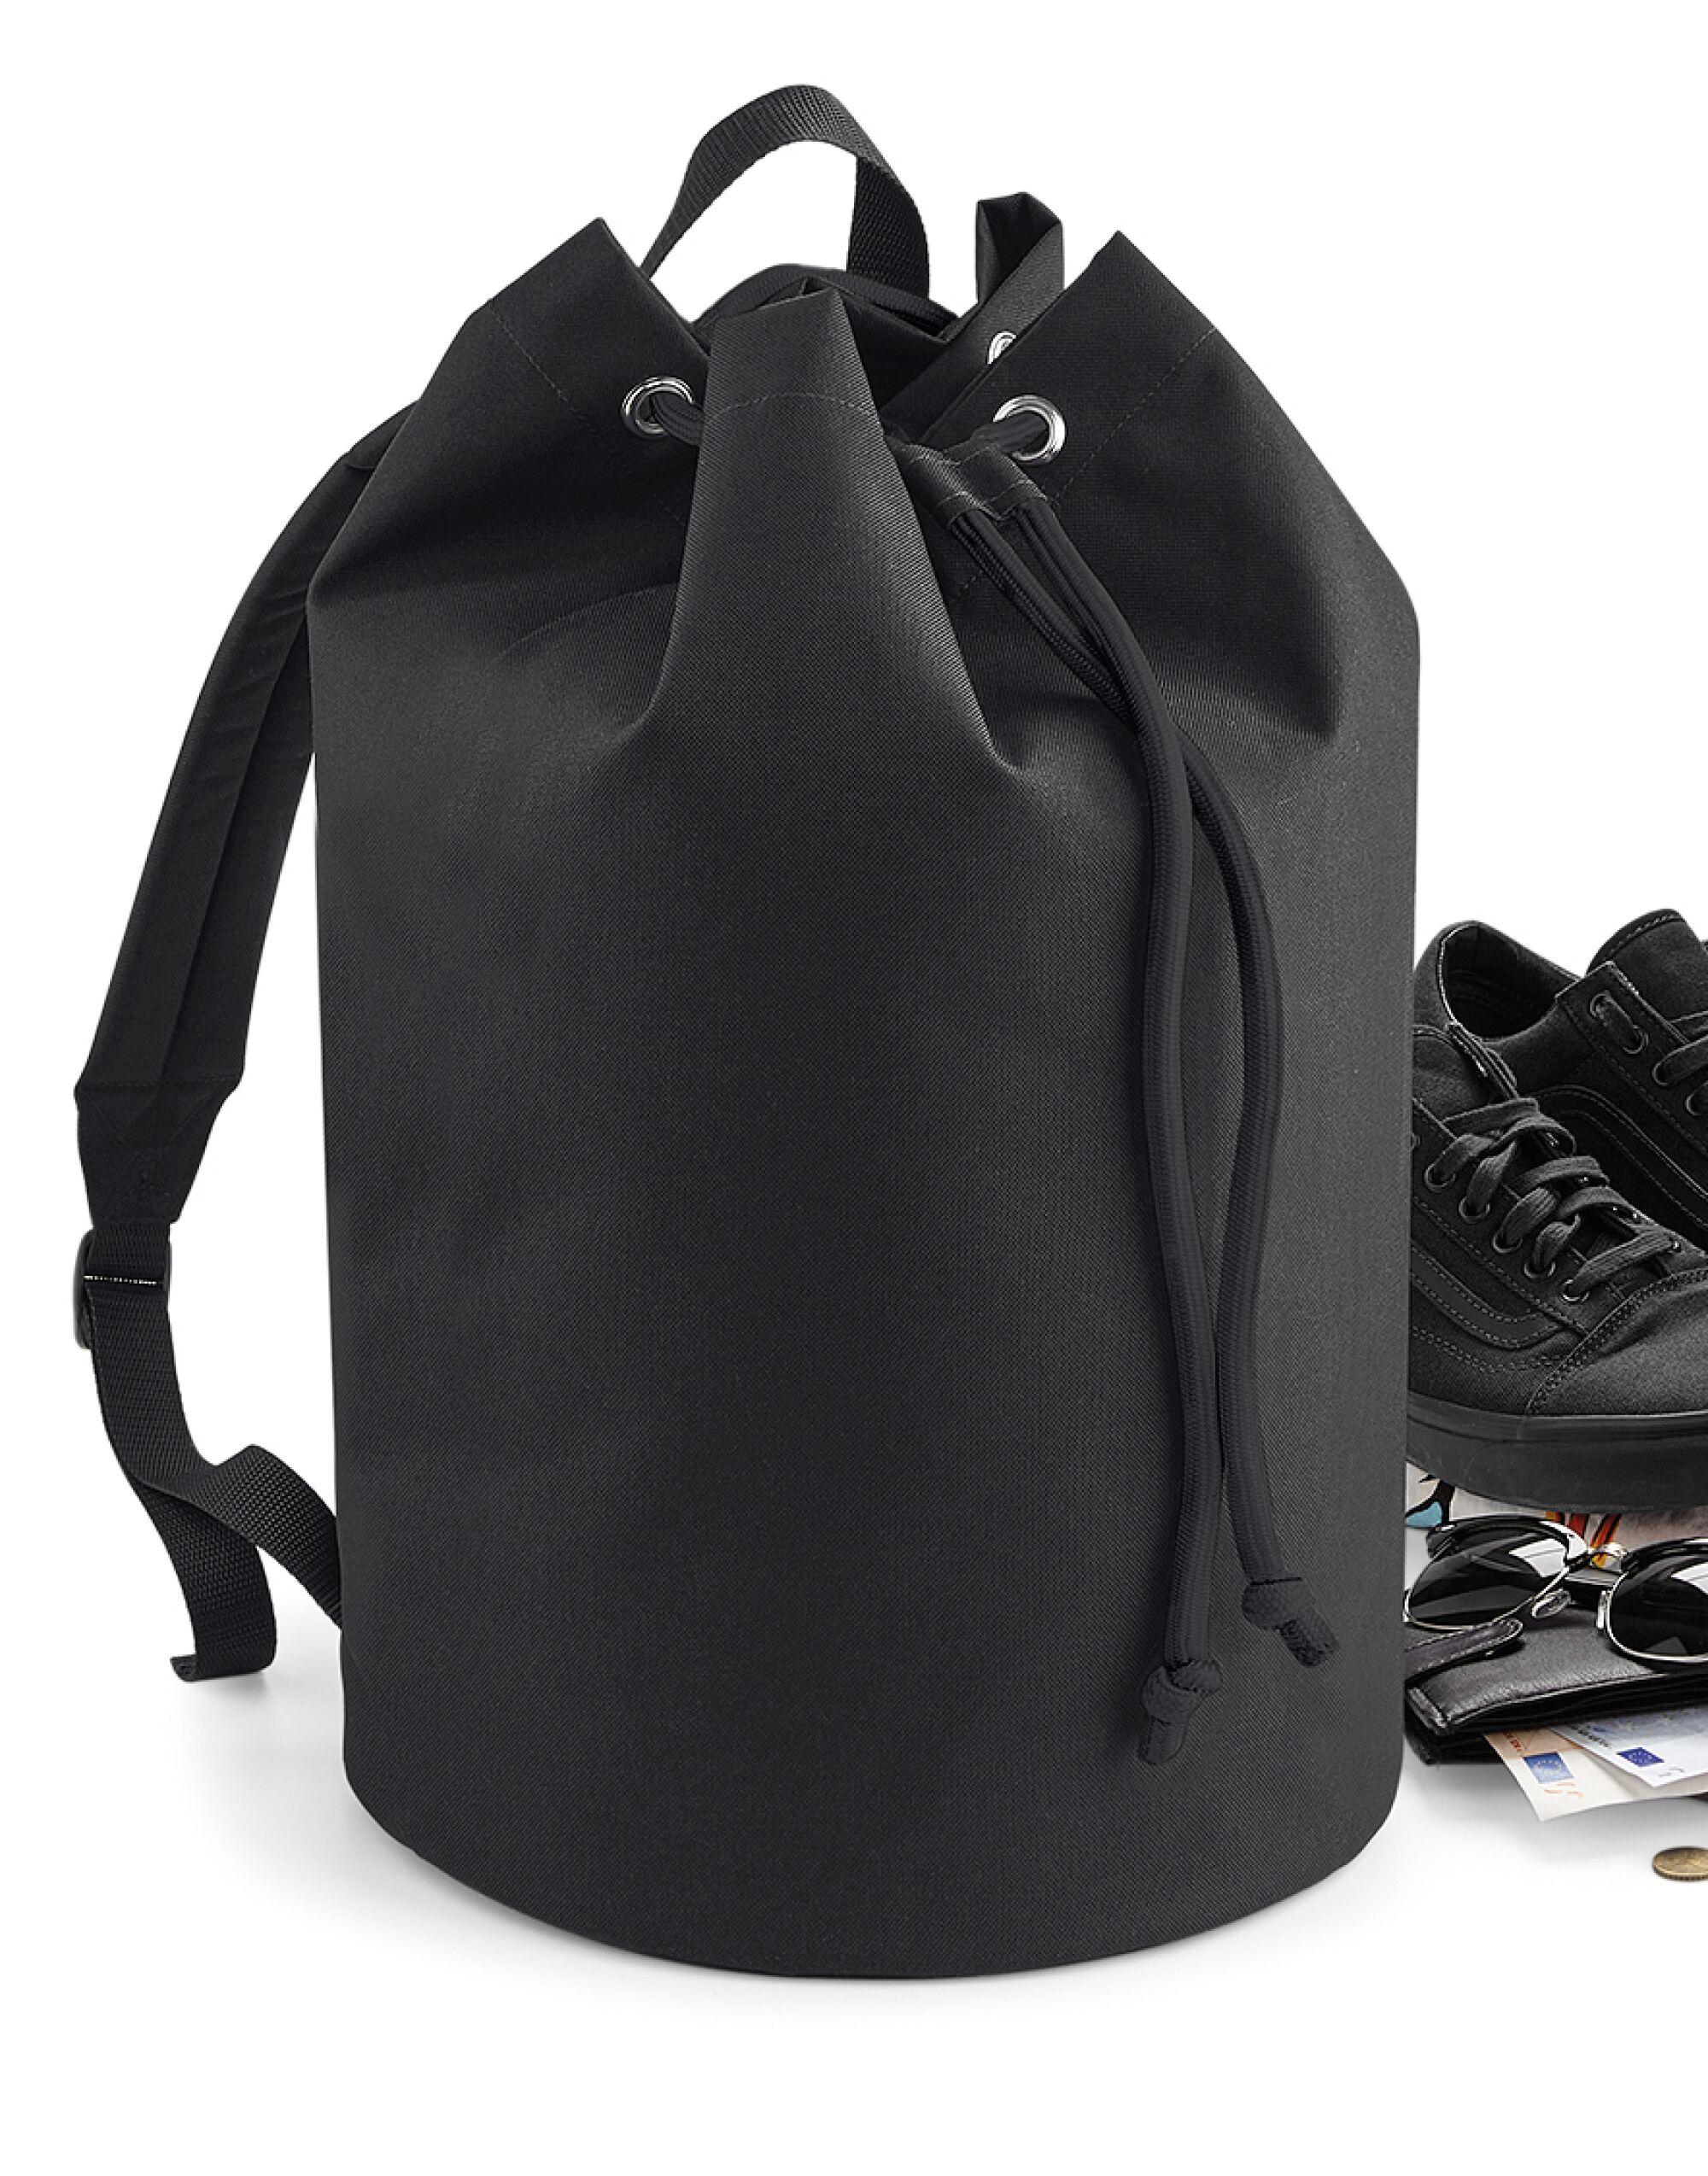 Bagbase Original Drawstring Backpack BG127